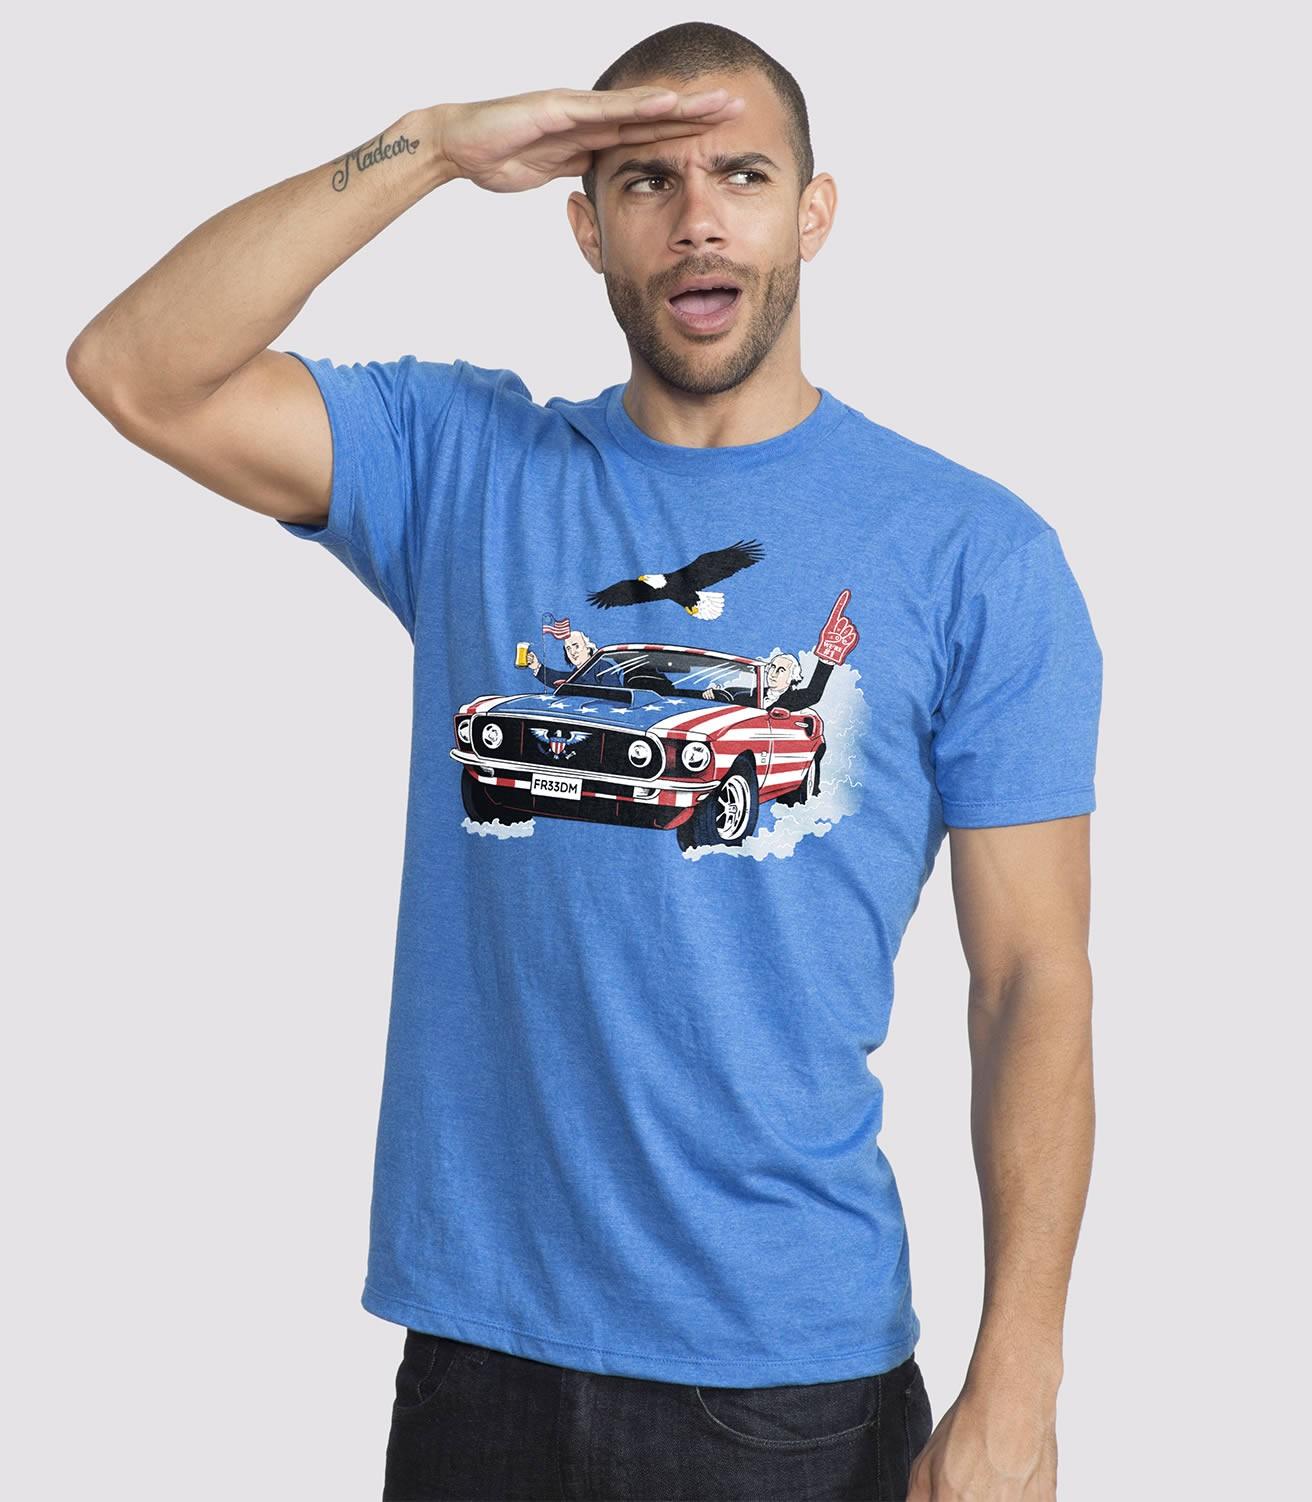 e6af7f8c USA! USA! USA! Men's Funny T-Shirt   Headline Shirts